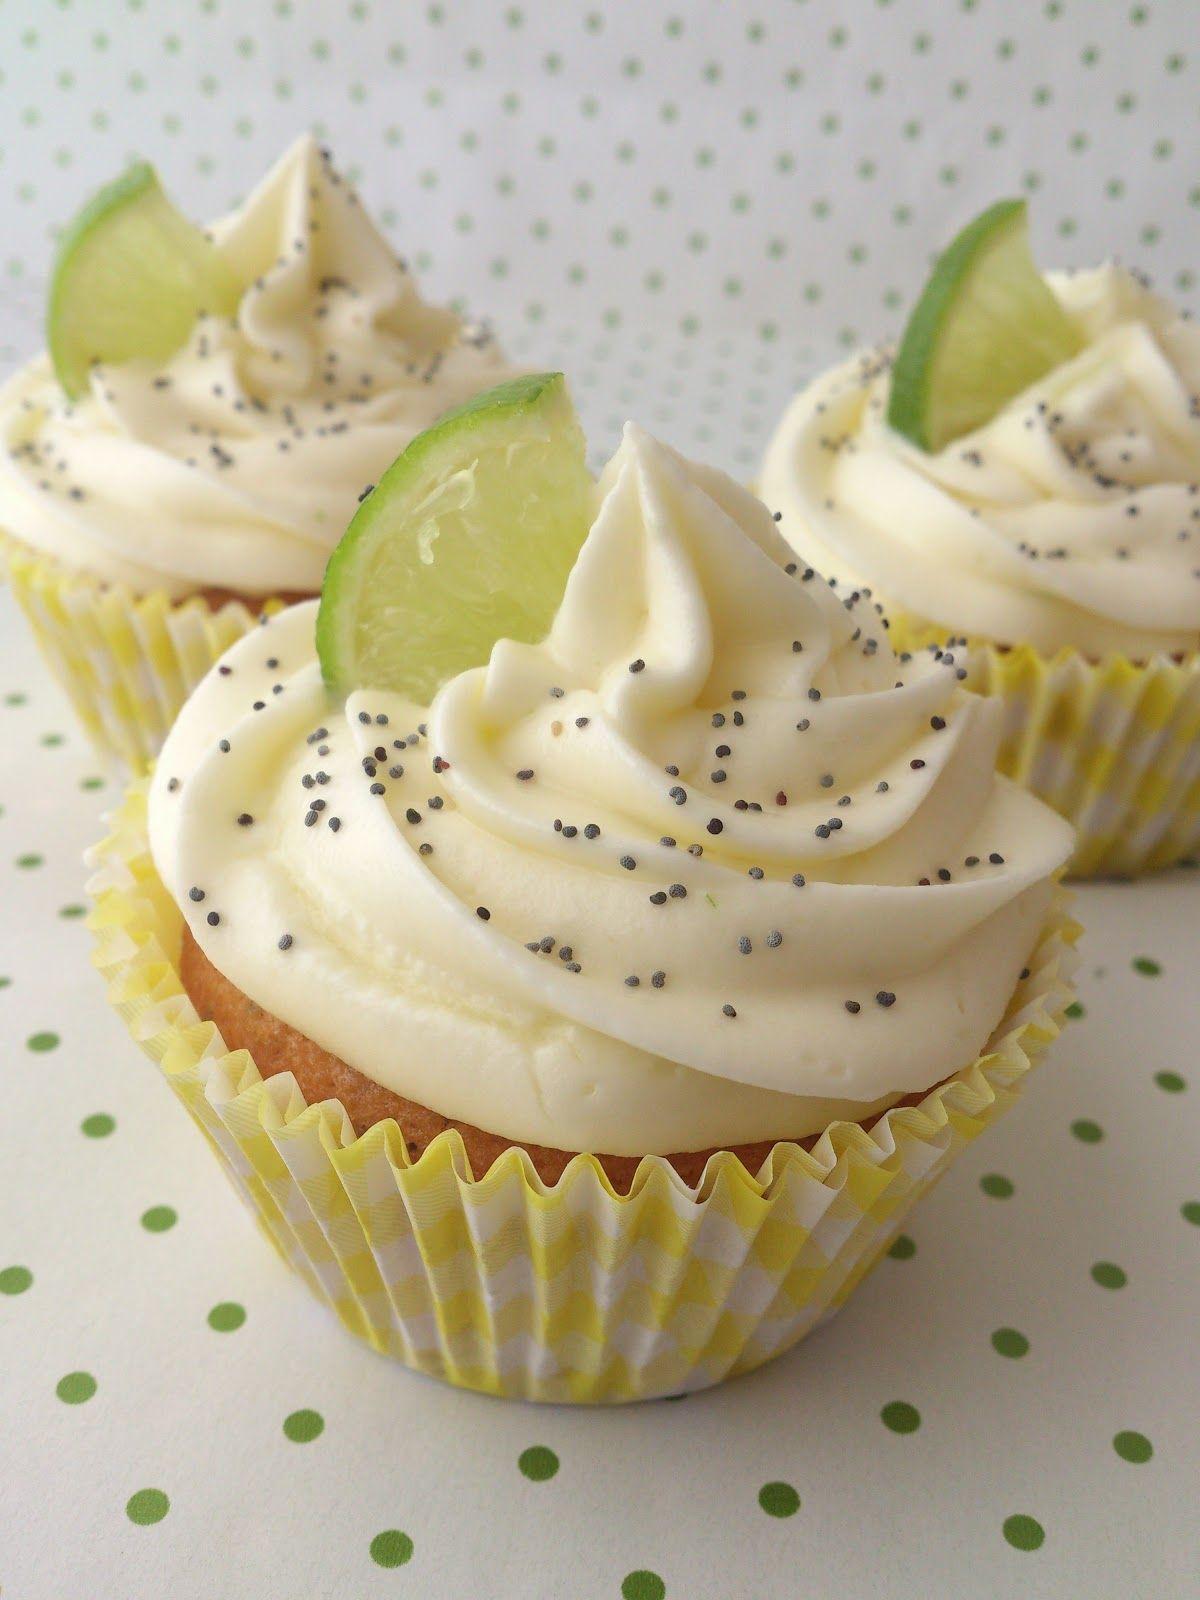 Frambuesa y Caramelo: Cupcakes lima-limon con semillas de amapola